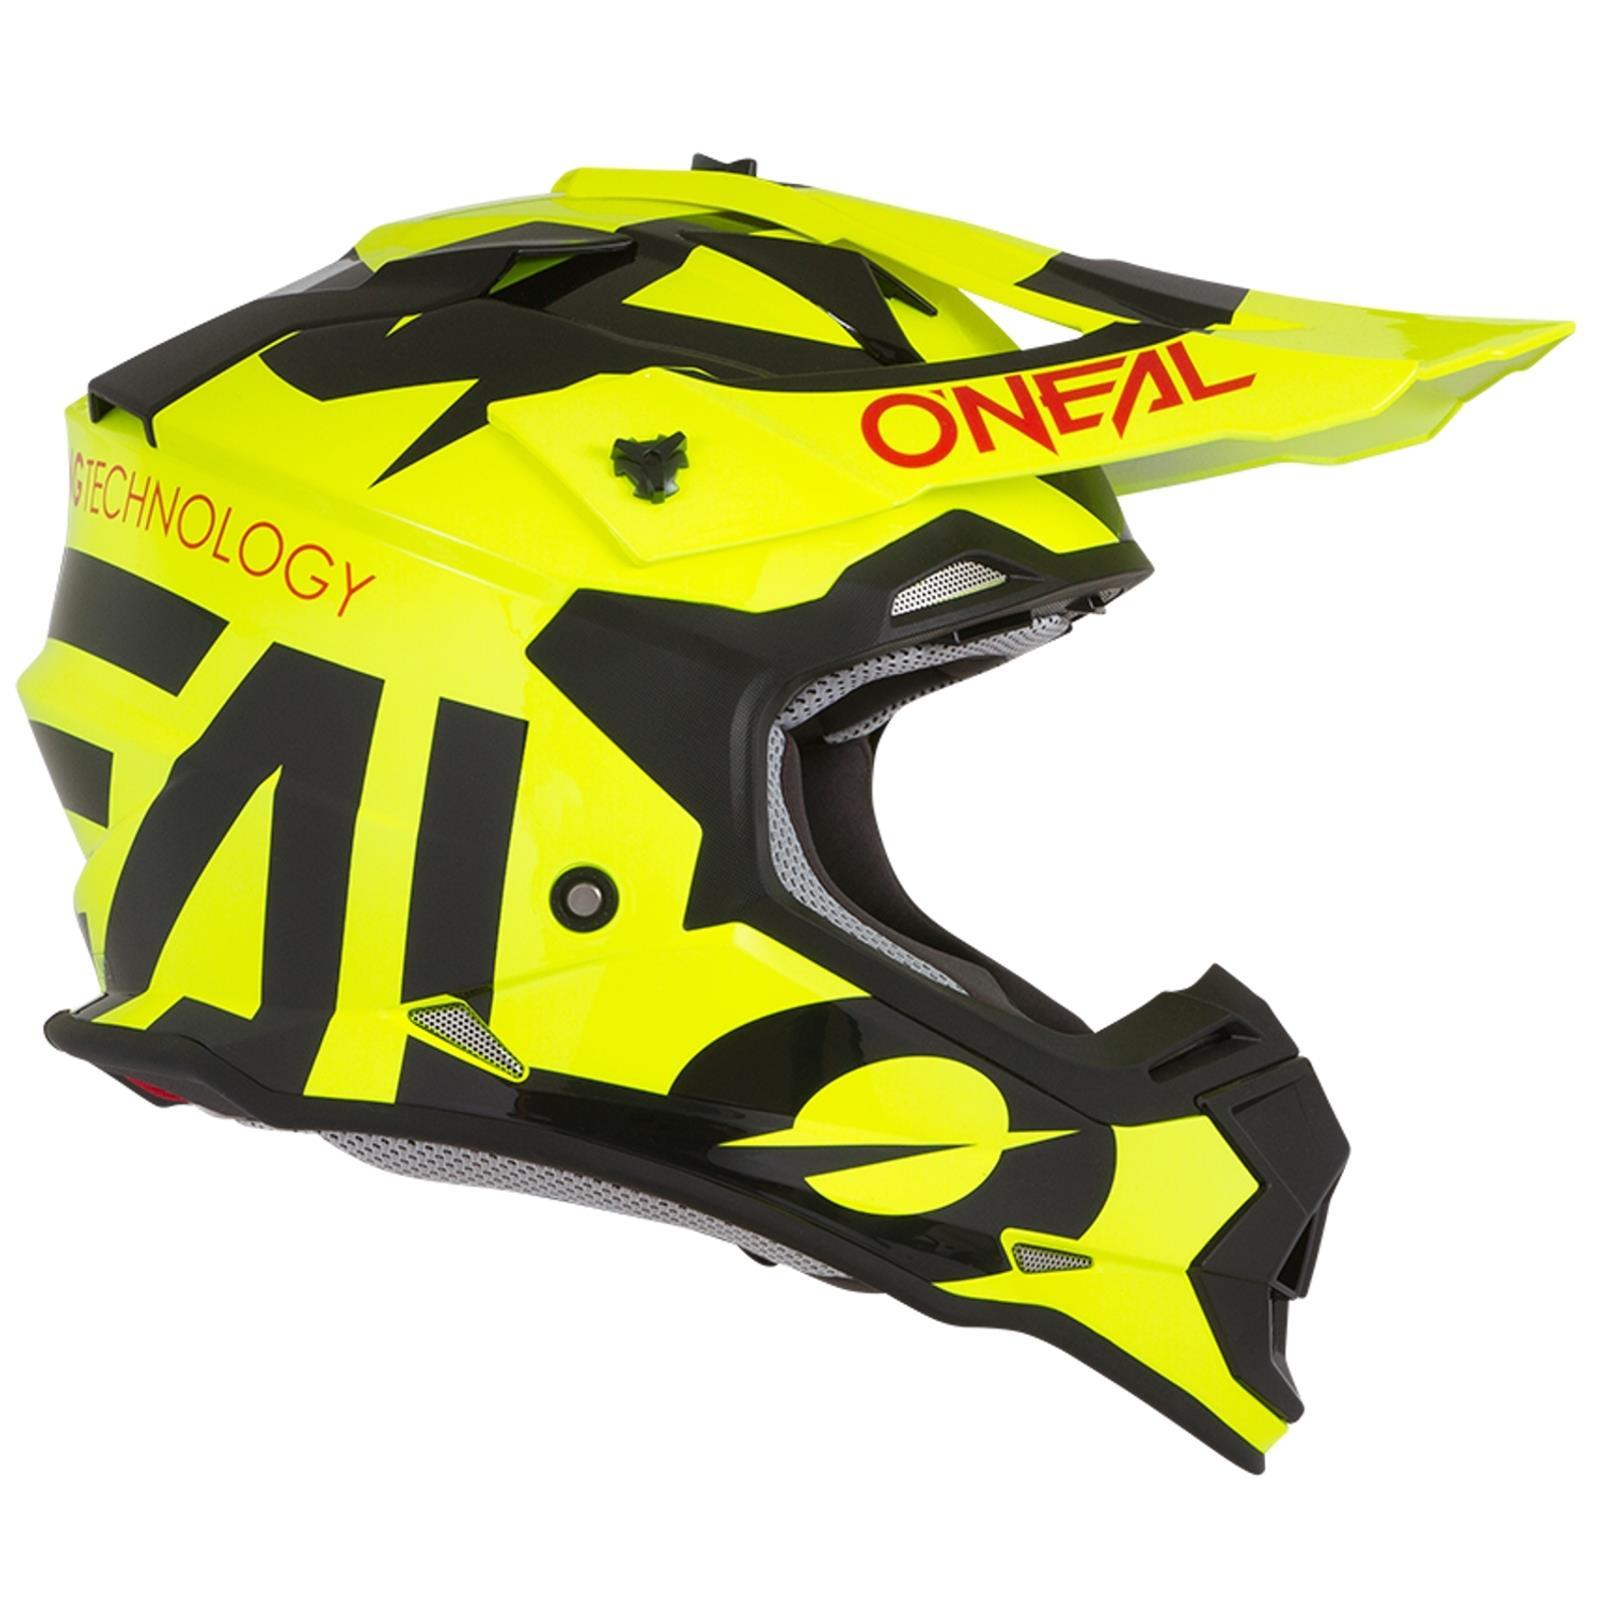 ONeal-Motocross-casco-MX-ENDURO-MOTO-BICI-FUORISTRADA-CROSS-Series-Adventure miniatura 5